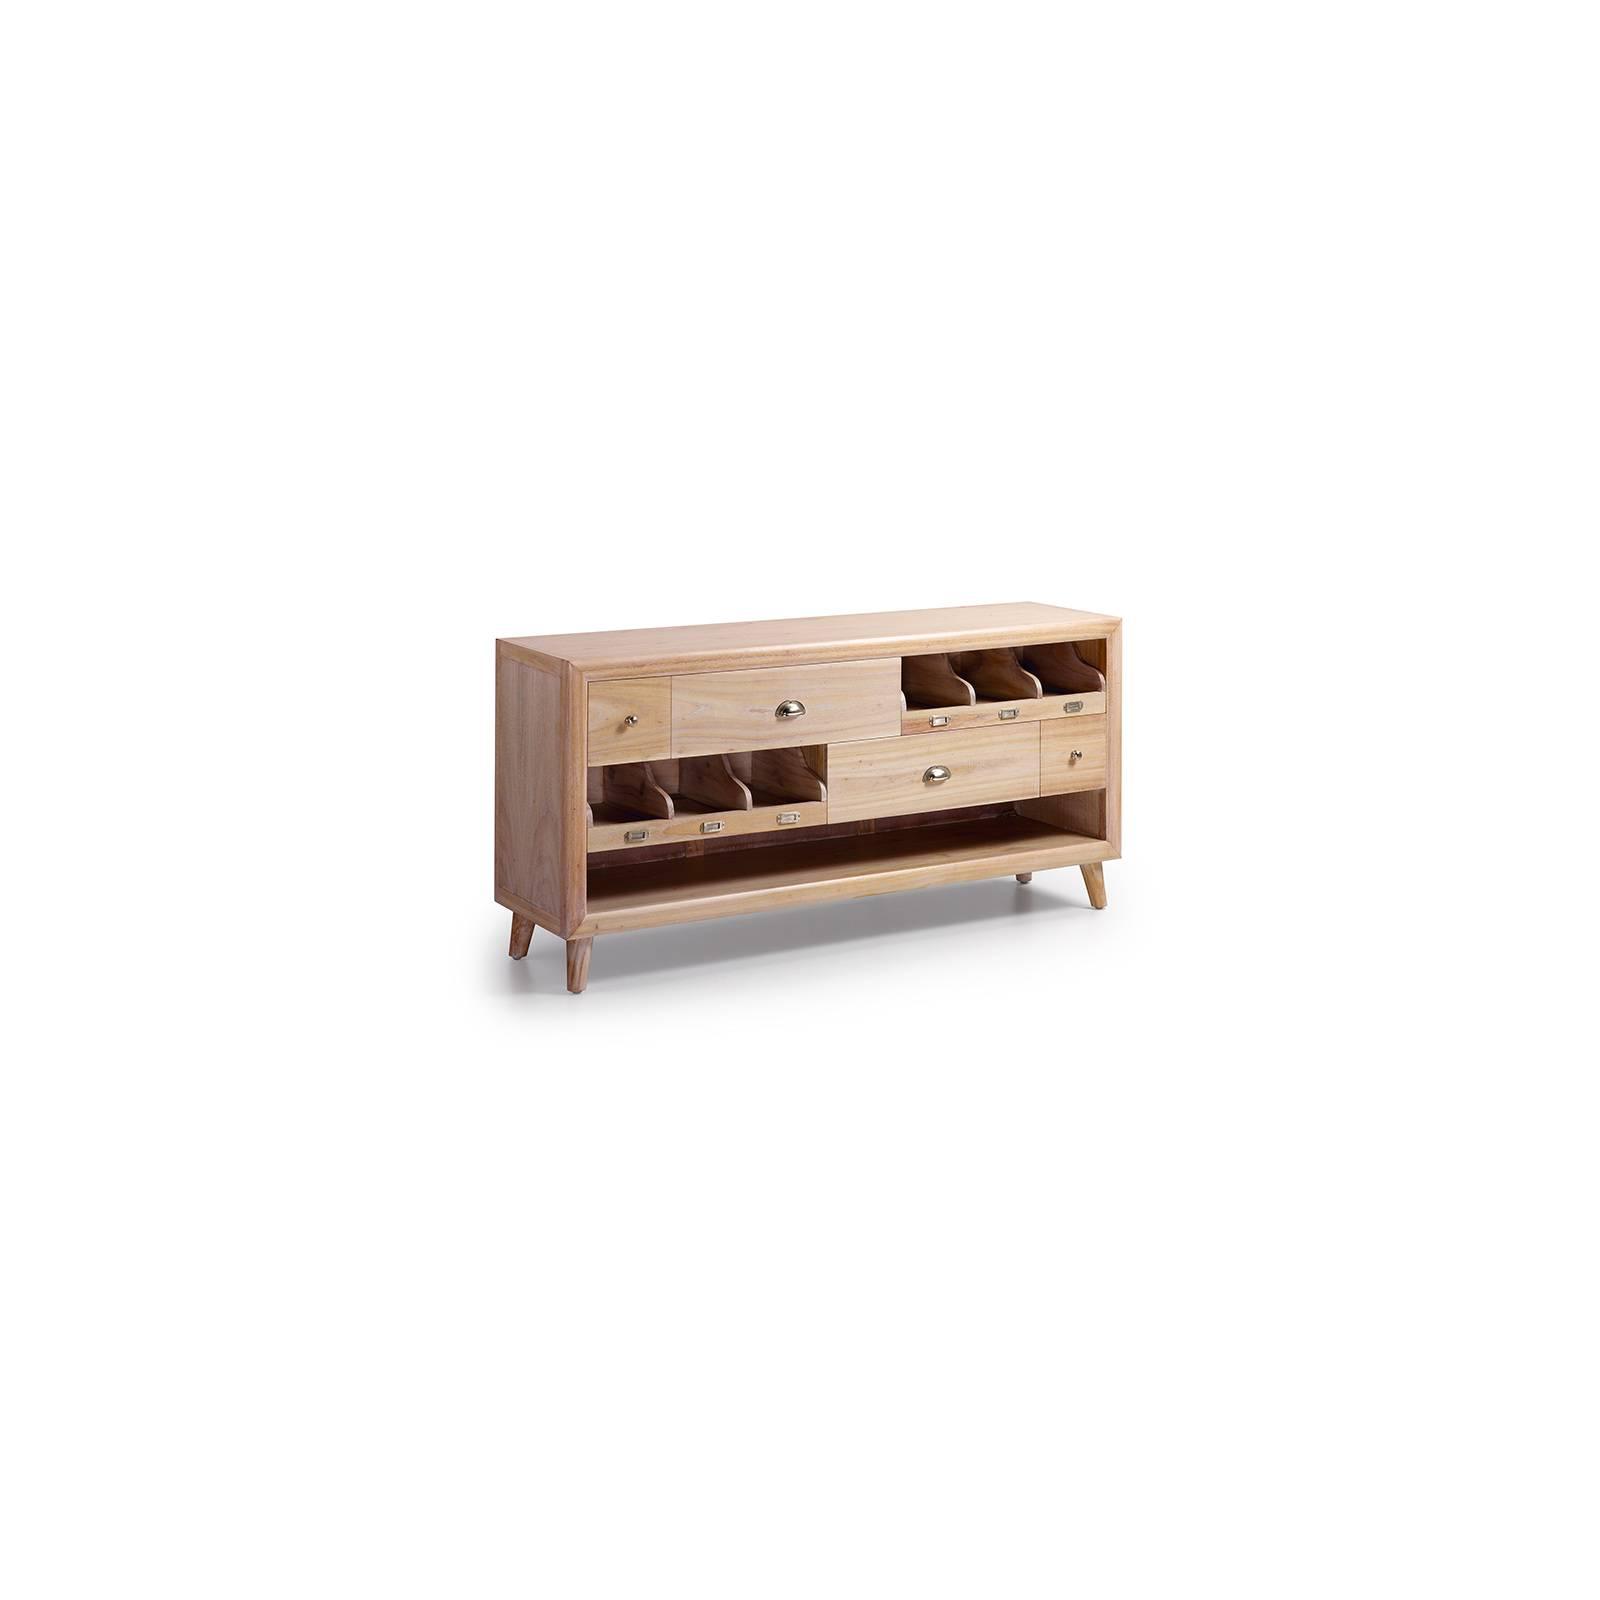 Meuble Tv Medium Oslo Mindy - meuble bois massif